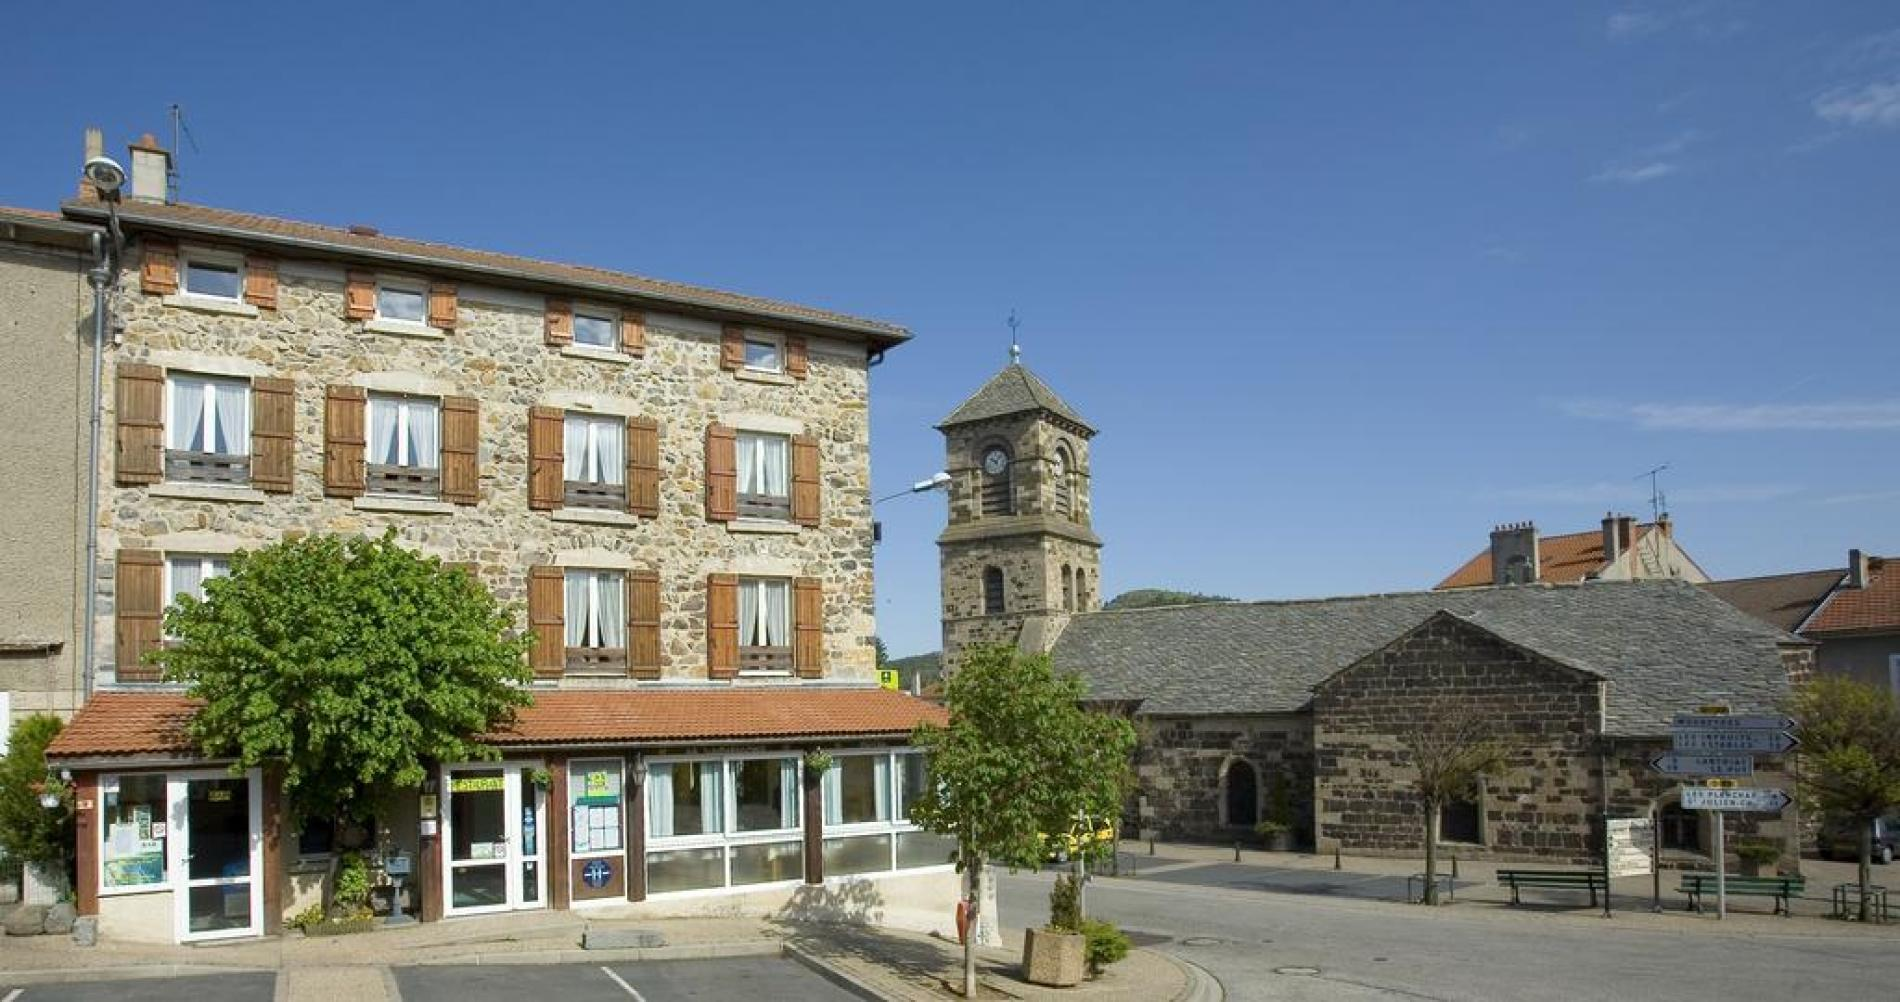 Le Clair Logis Hotel